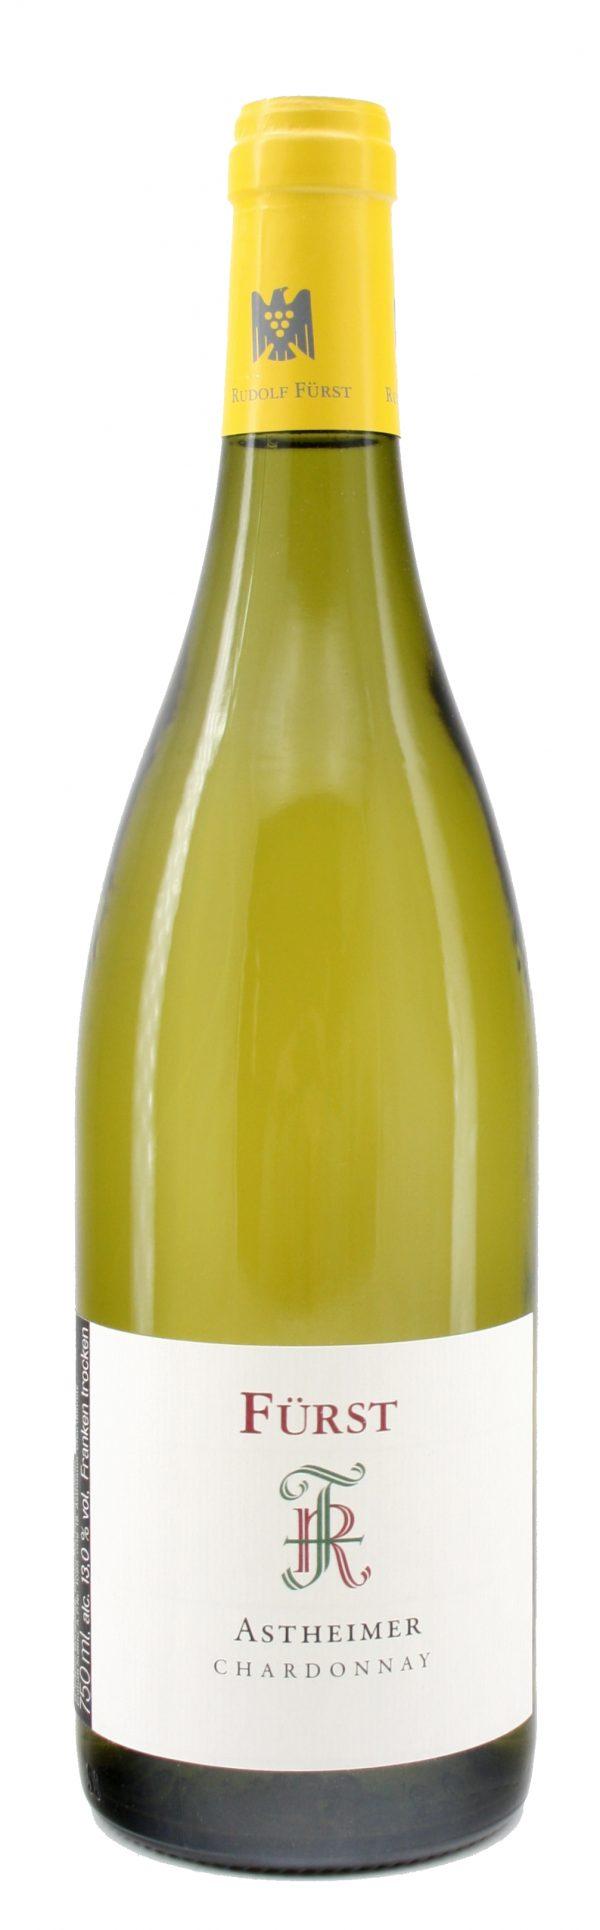 Astheimer Chardonnay 2016